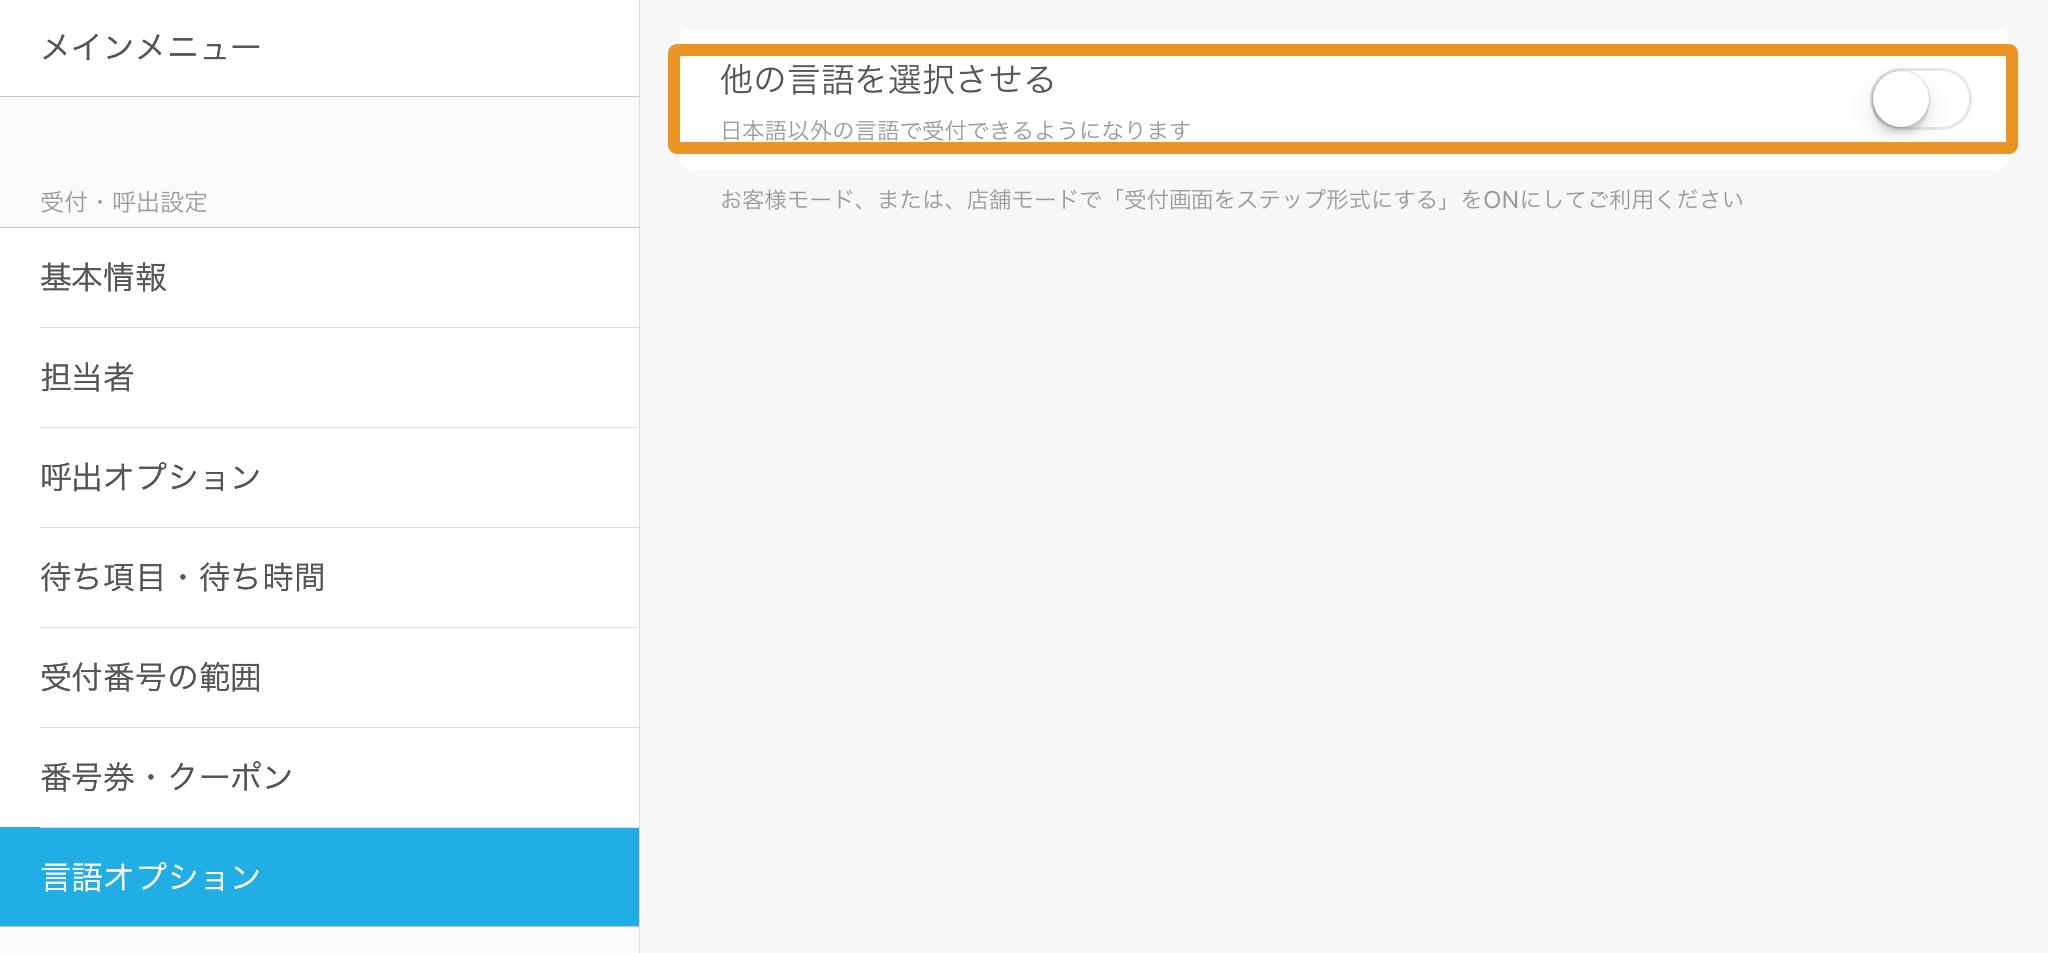 Airウェイト 管理者メニュー 言語オプション 他の言語を選択させる